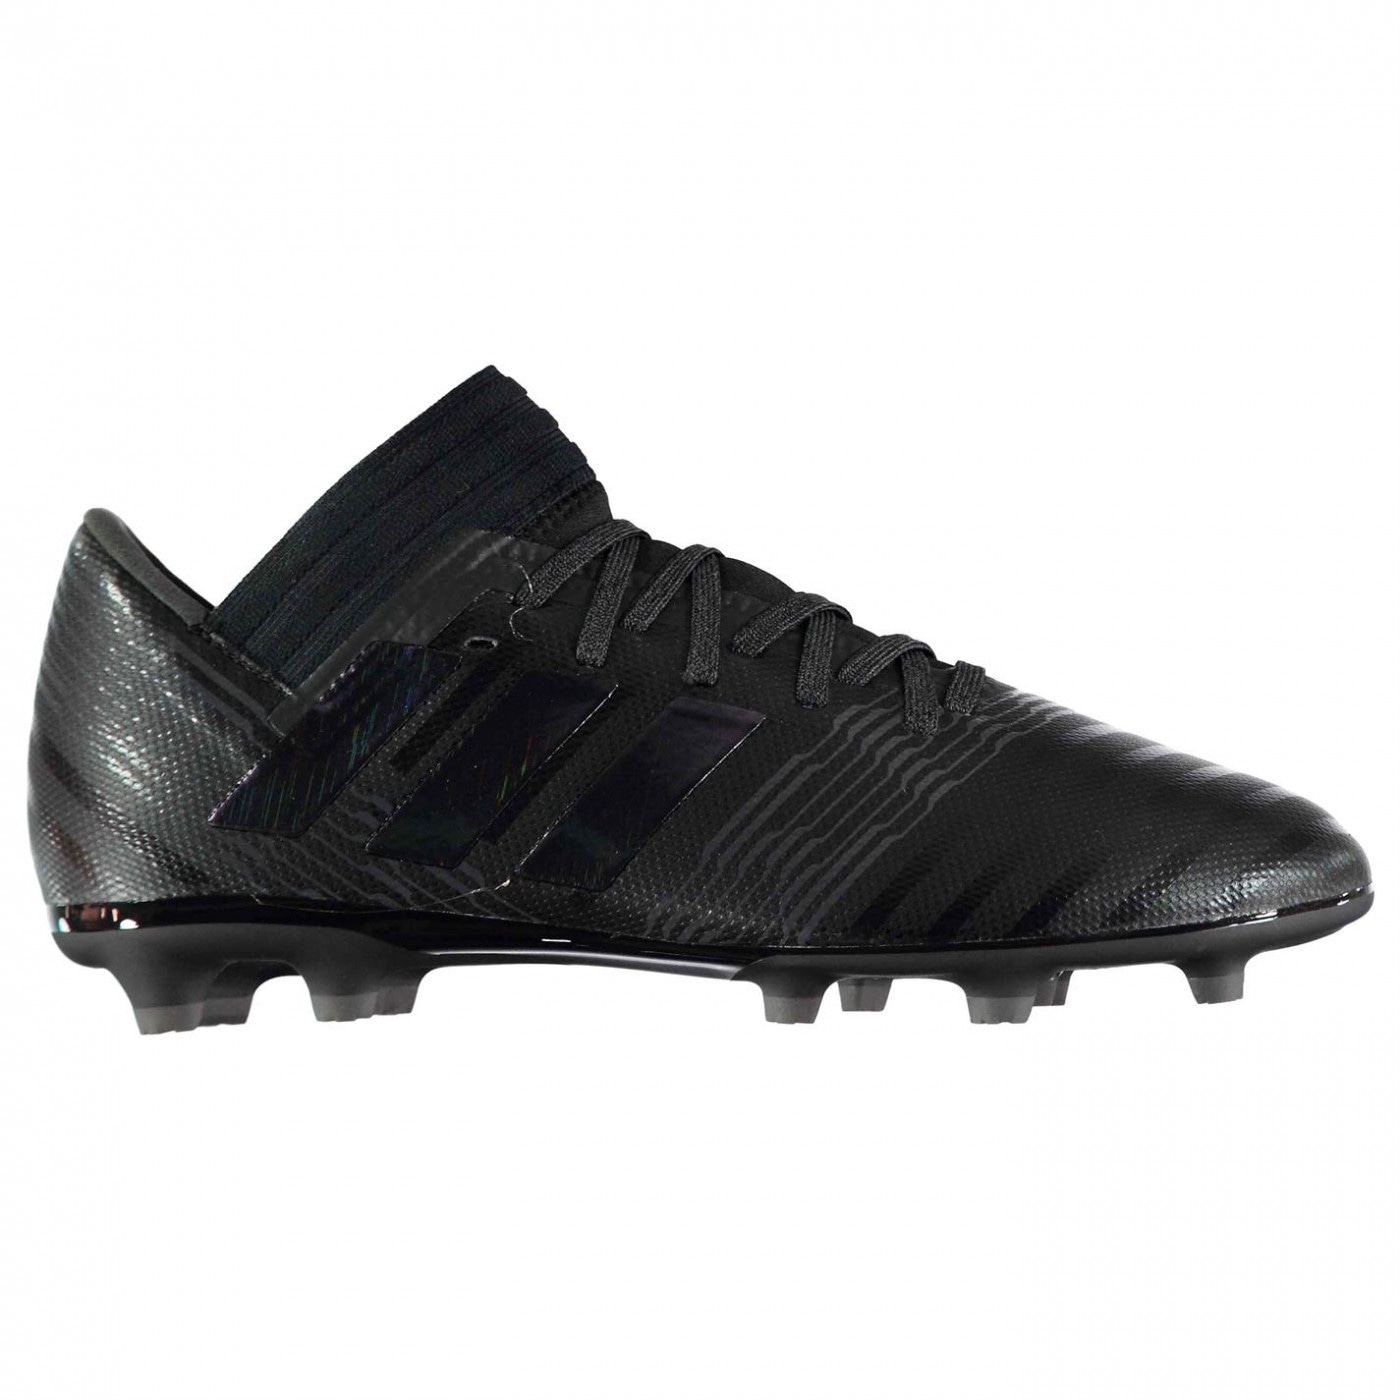 Adidas Nemeziz 17.3 FG Junior Football Boots